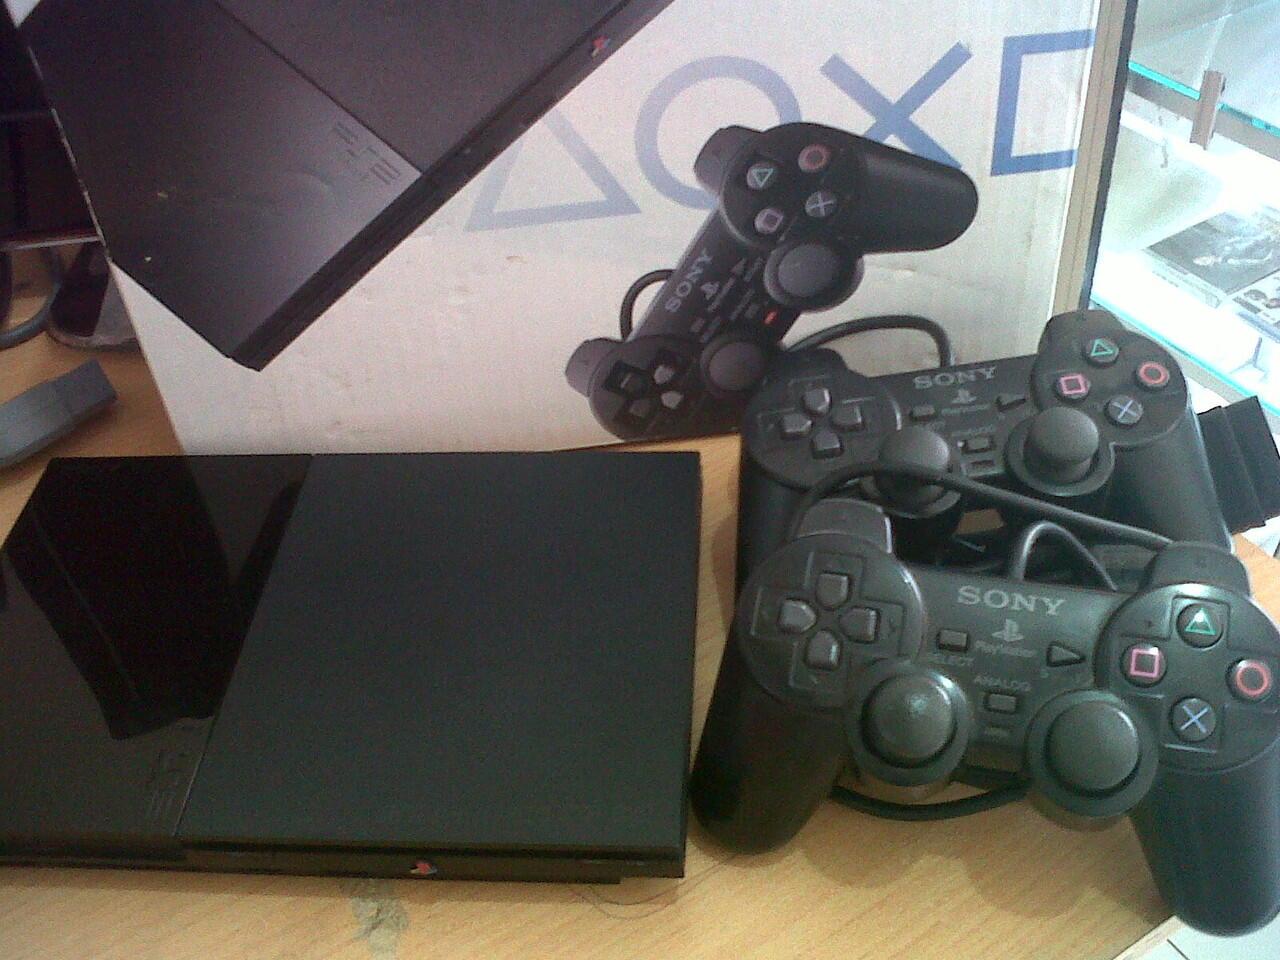 PS2 SLiM 9006 + 2 Stik Getar + LKP. METRO BANDUNG.